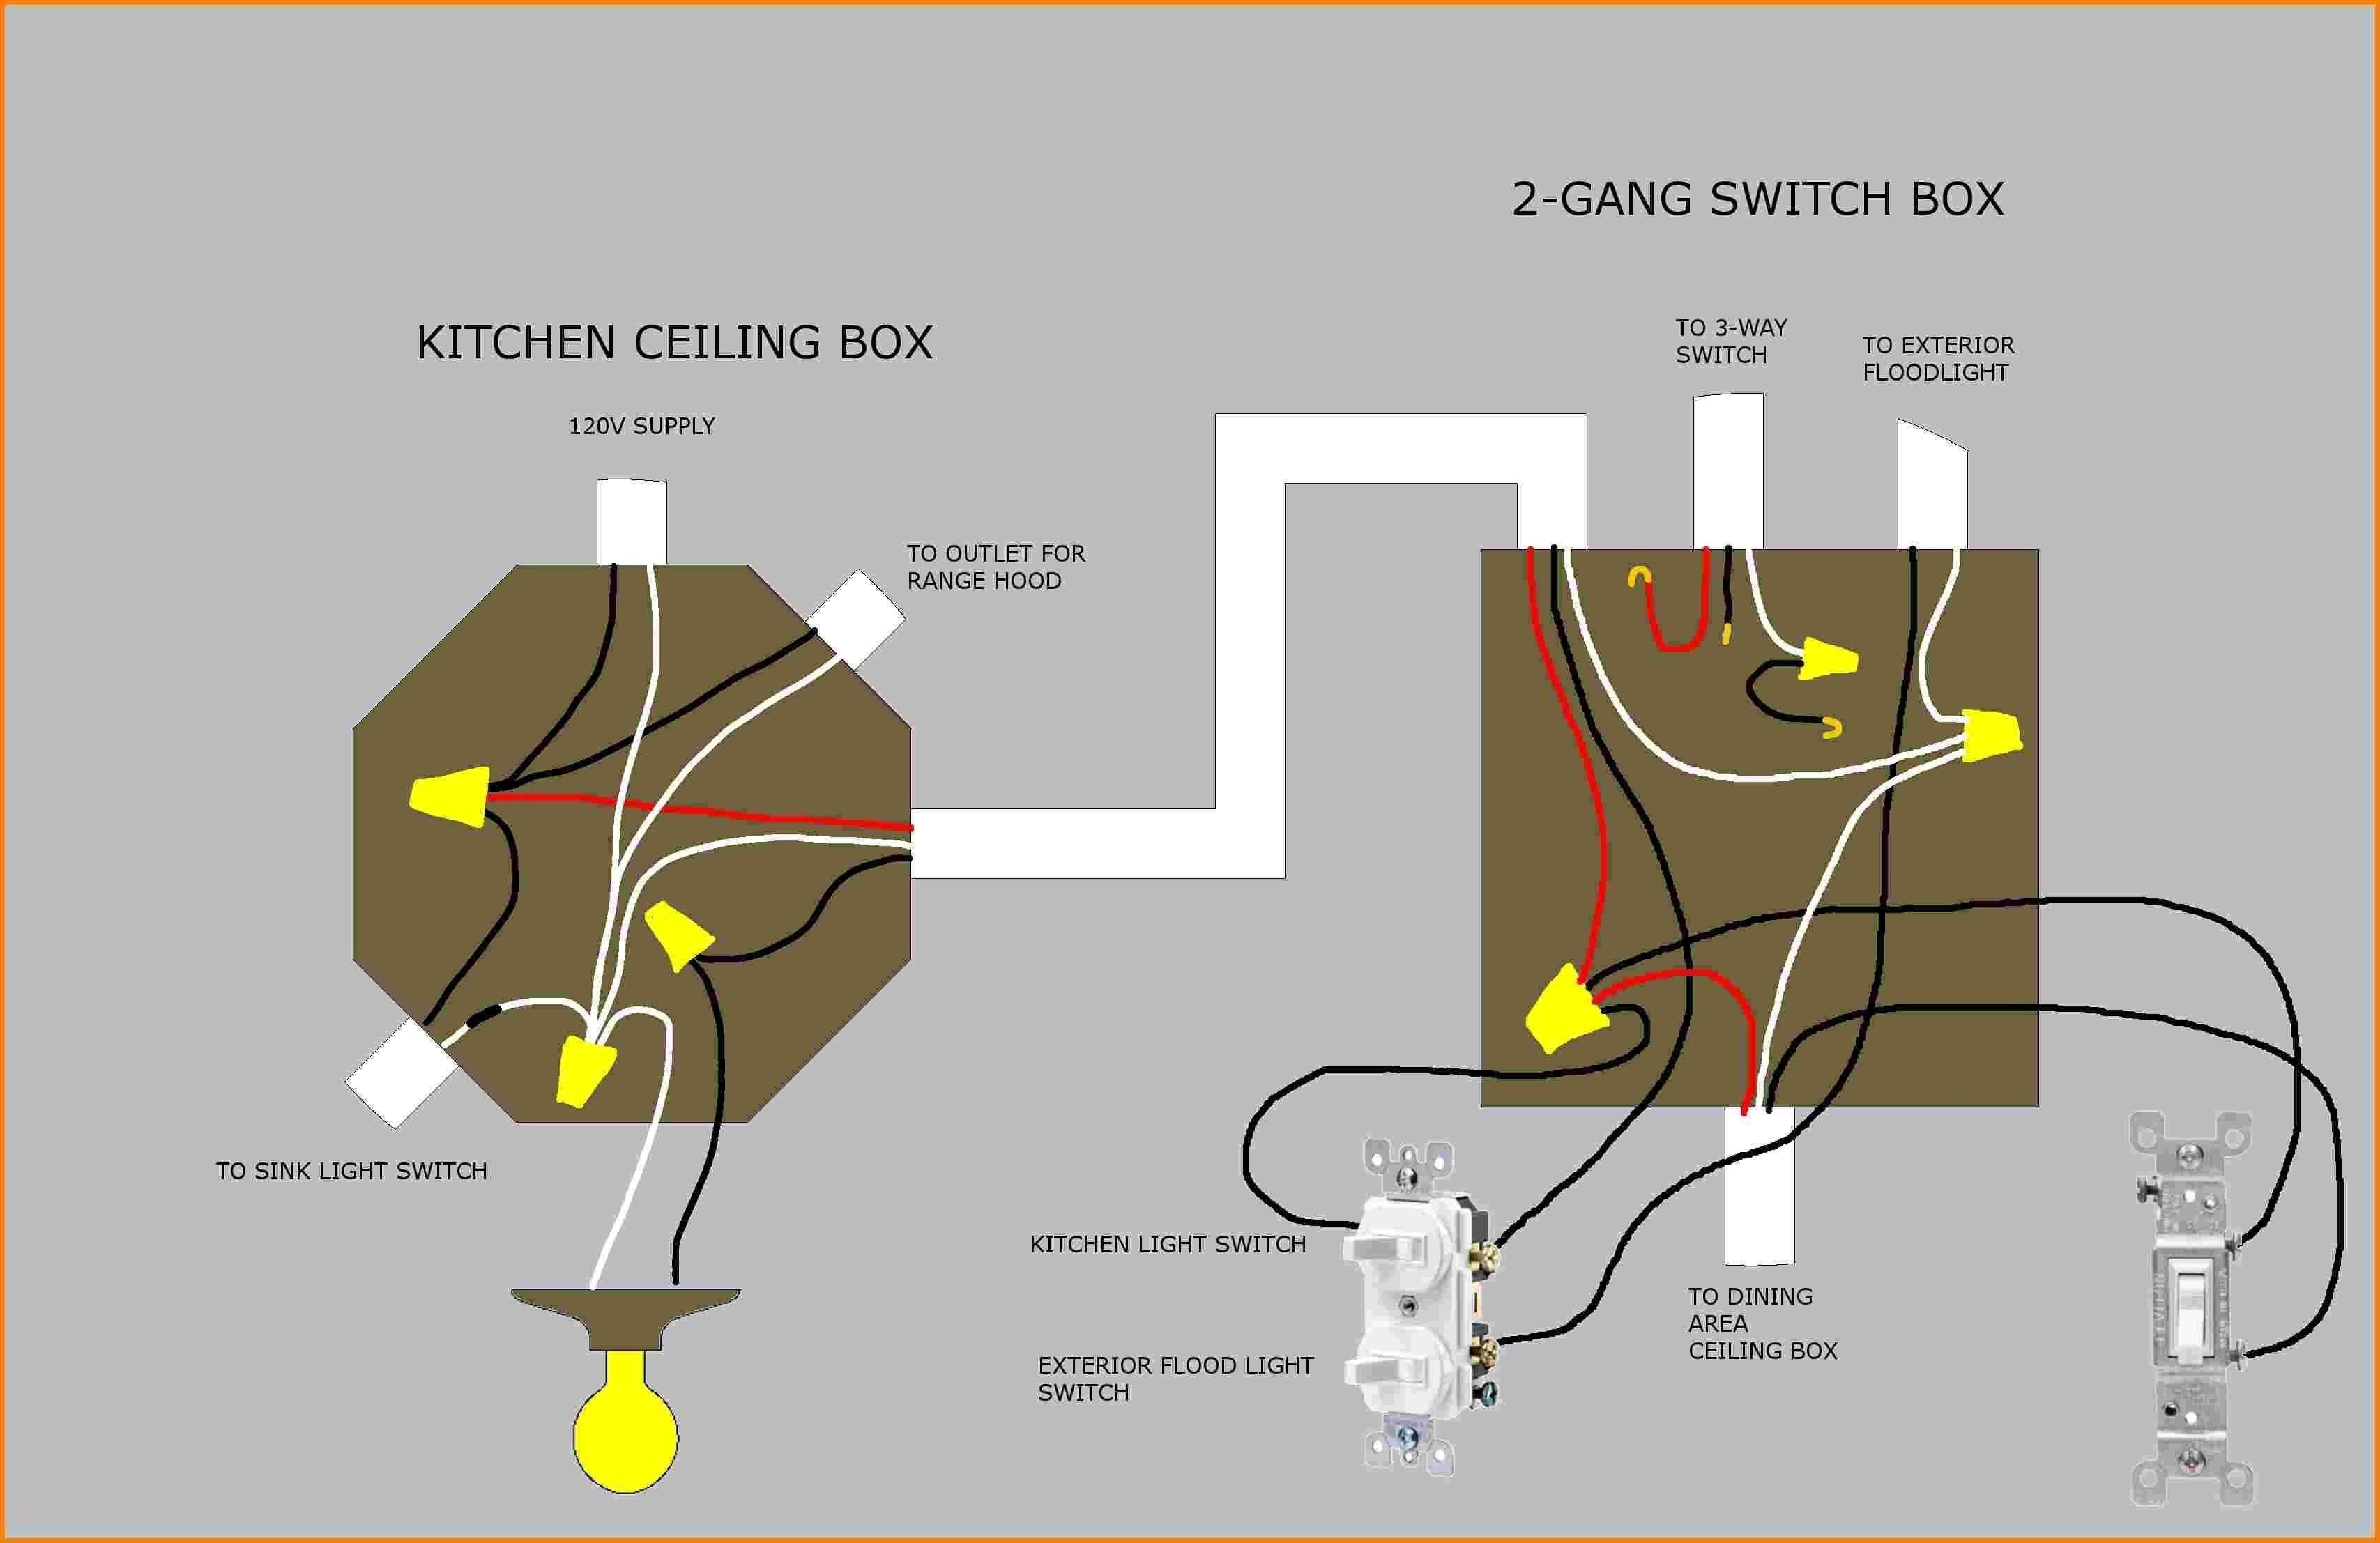 [SCHEMATICS_48ZD]  VS_9255] Range Hood Switch Wiring Diagram Schematic Wiring | Wiring Diagram For A Range Hood |  | Minaga Impa Rele Mohammedshrine Librar Wiring 101